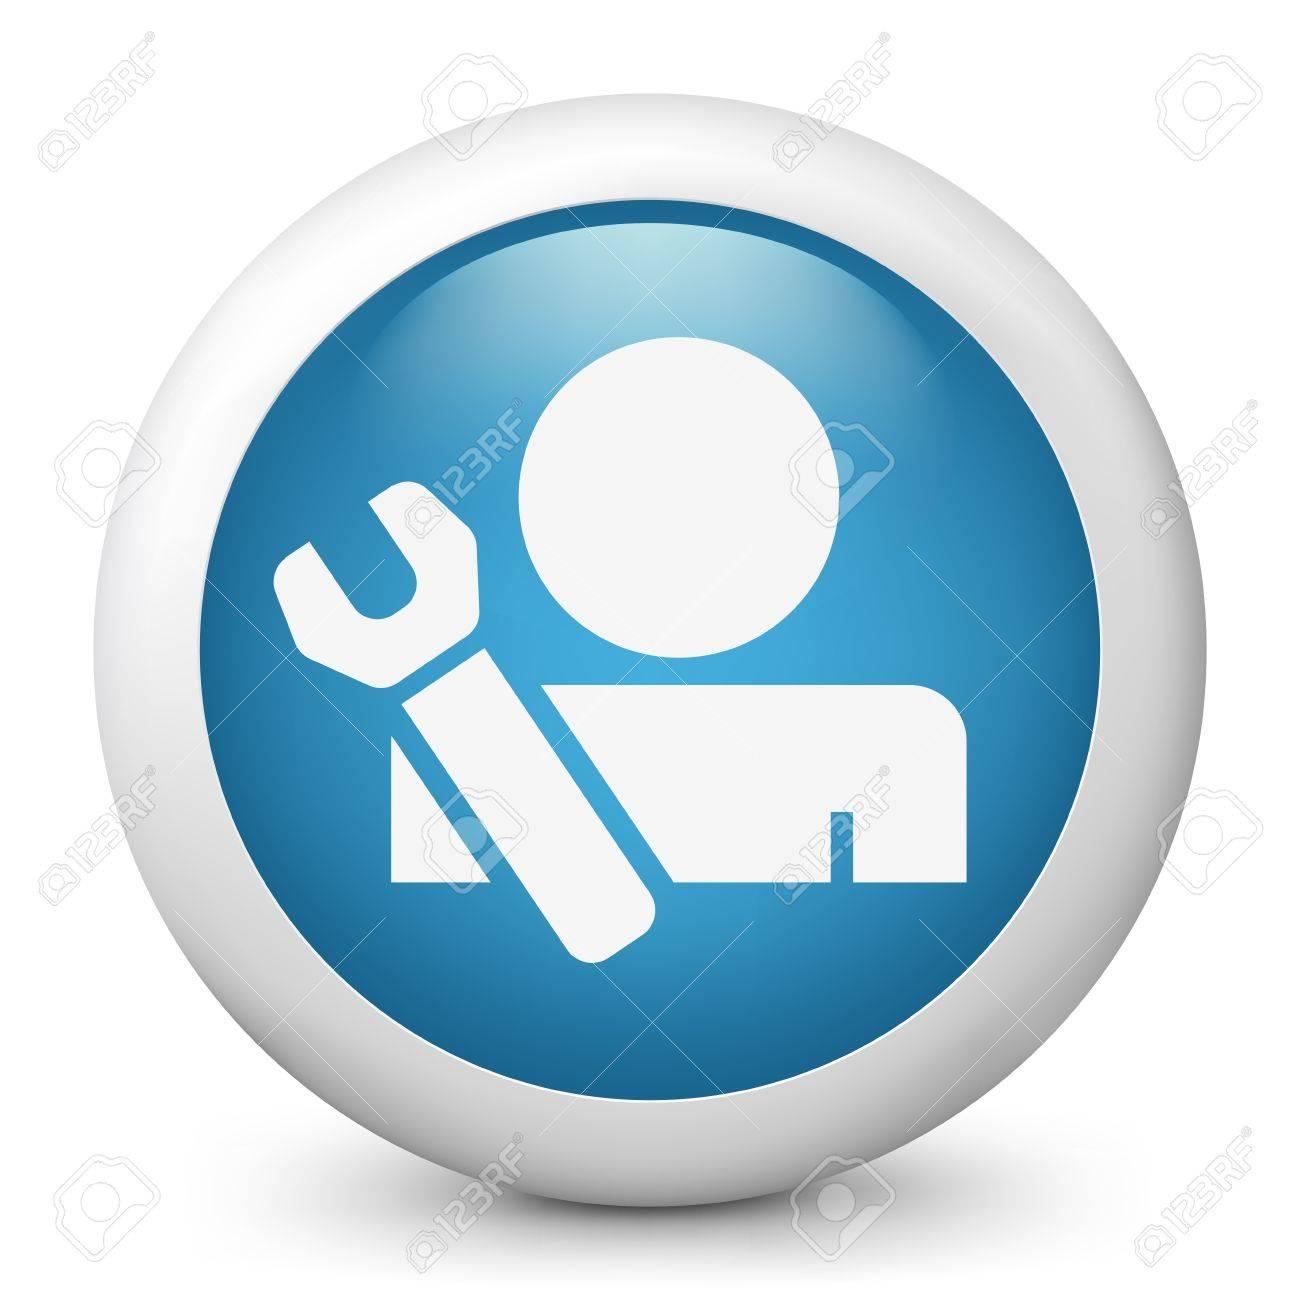 Worker concept symbol icon Stock Vector - 19876500